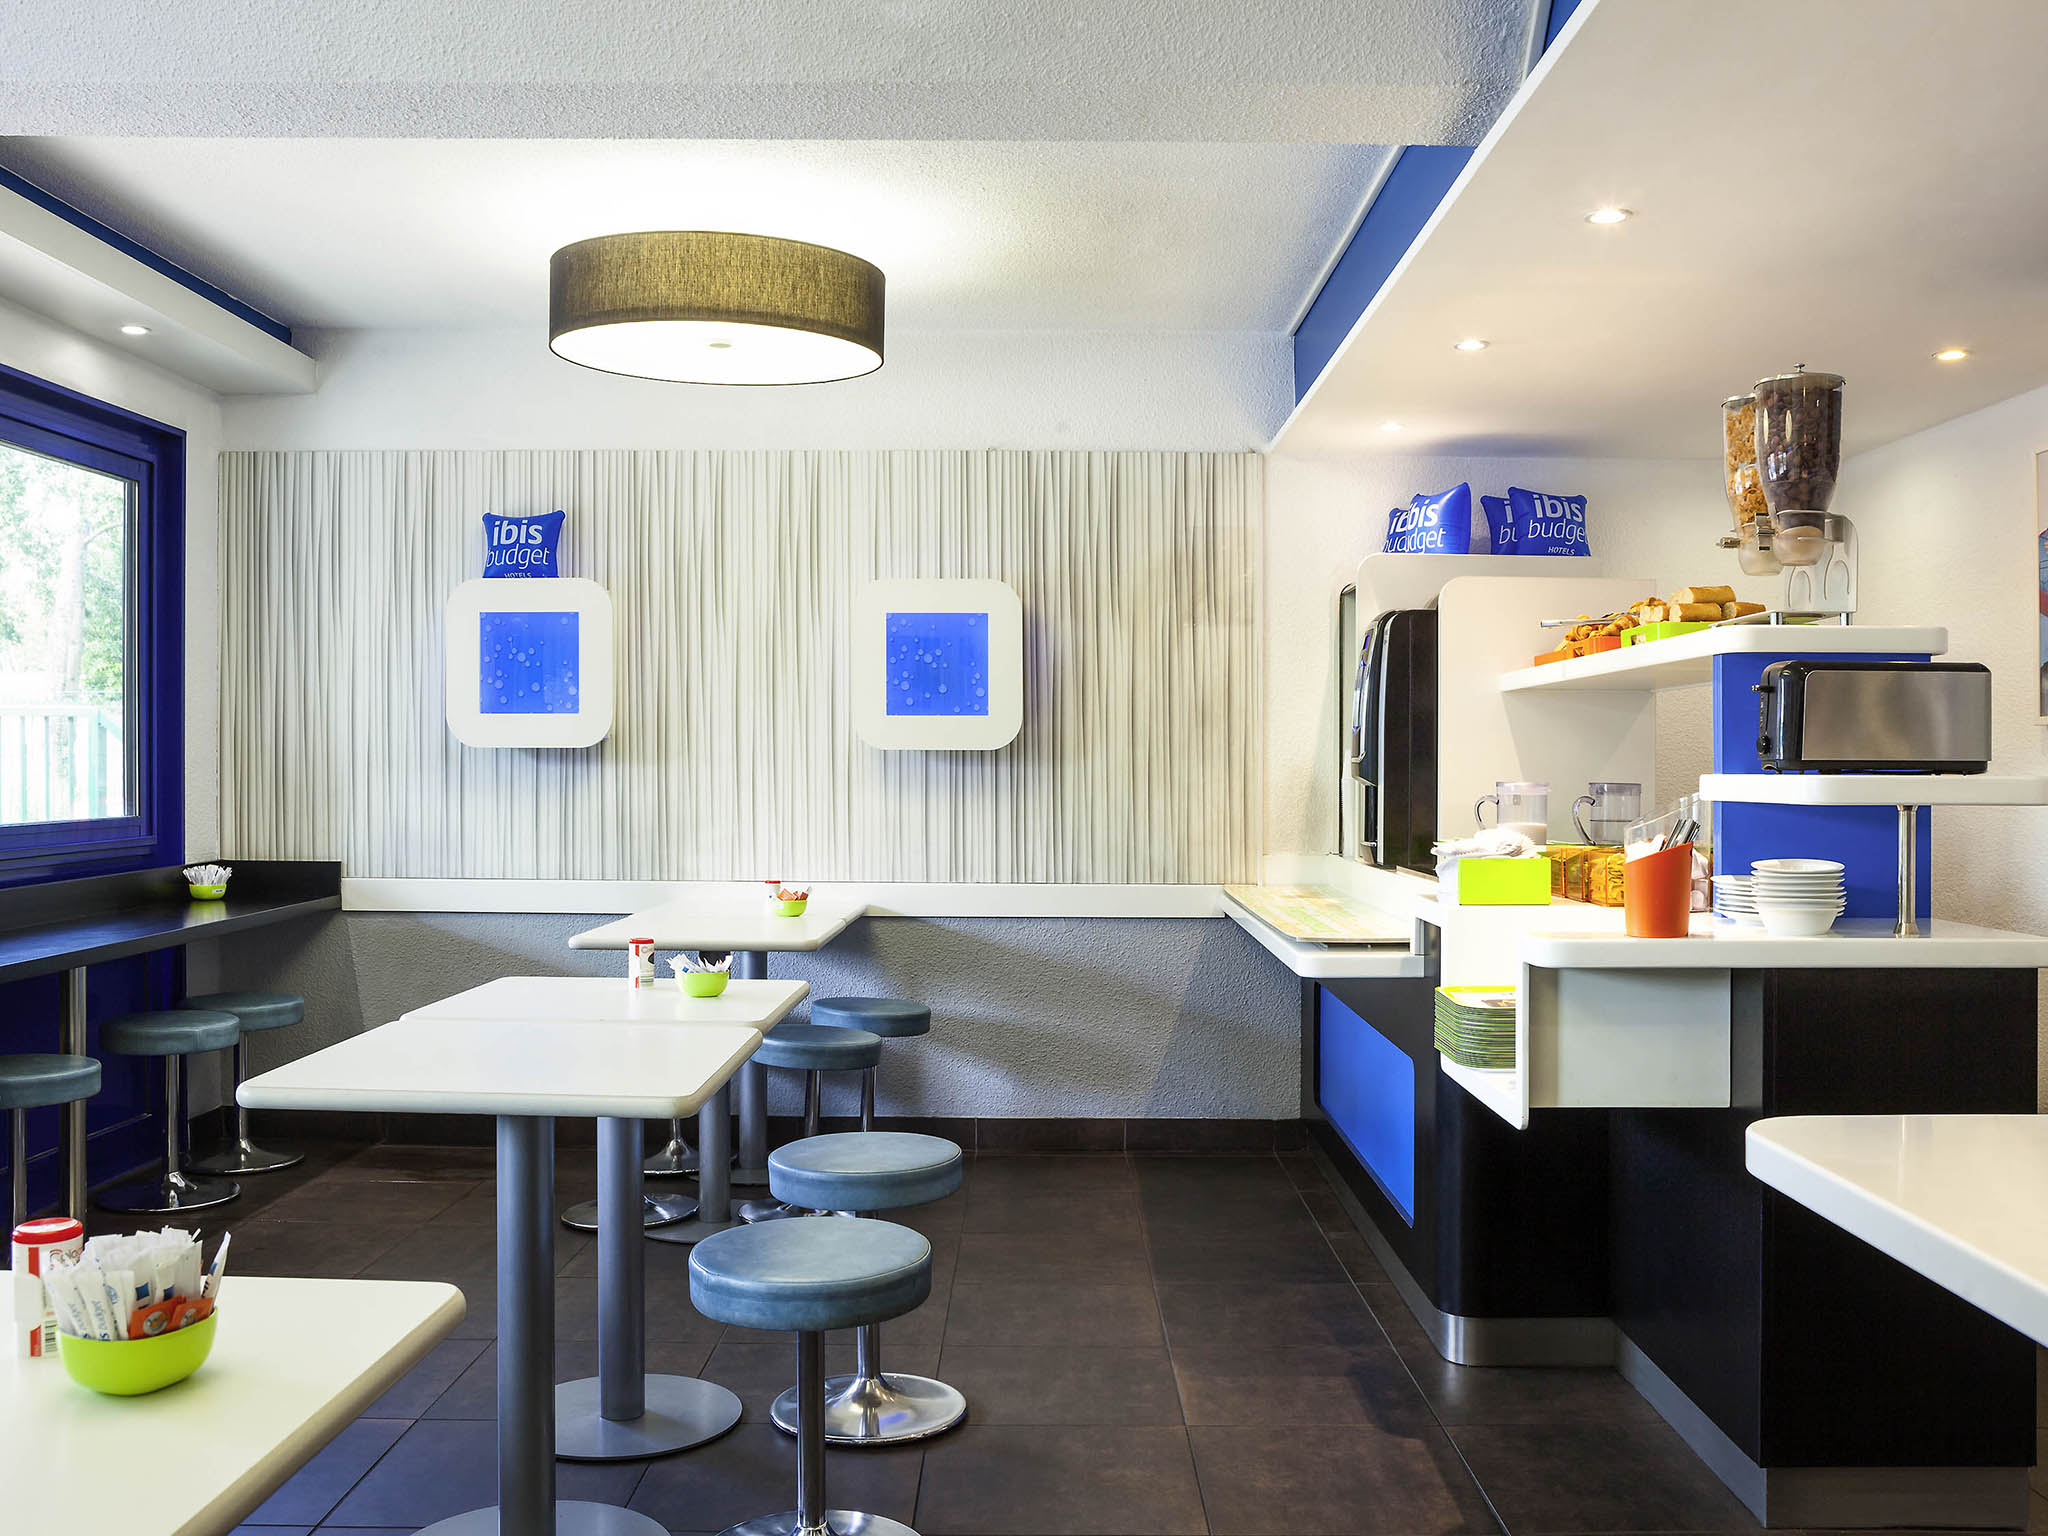 Hotel In Sucy En Brie